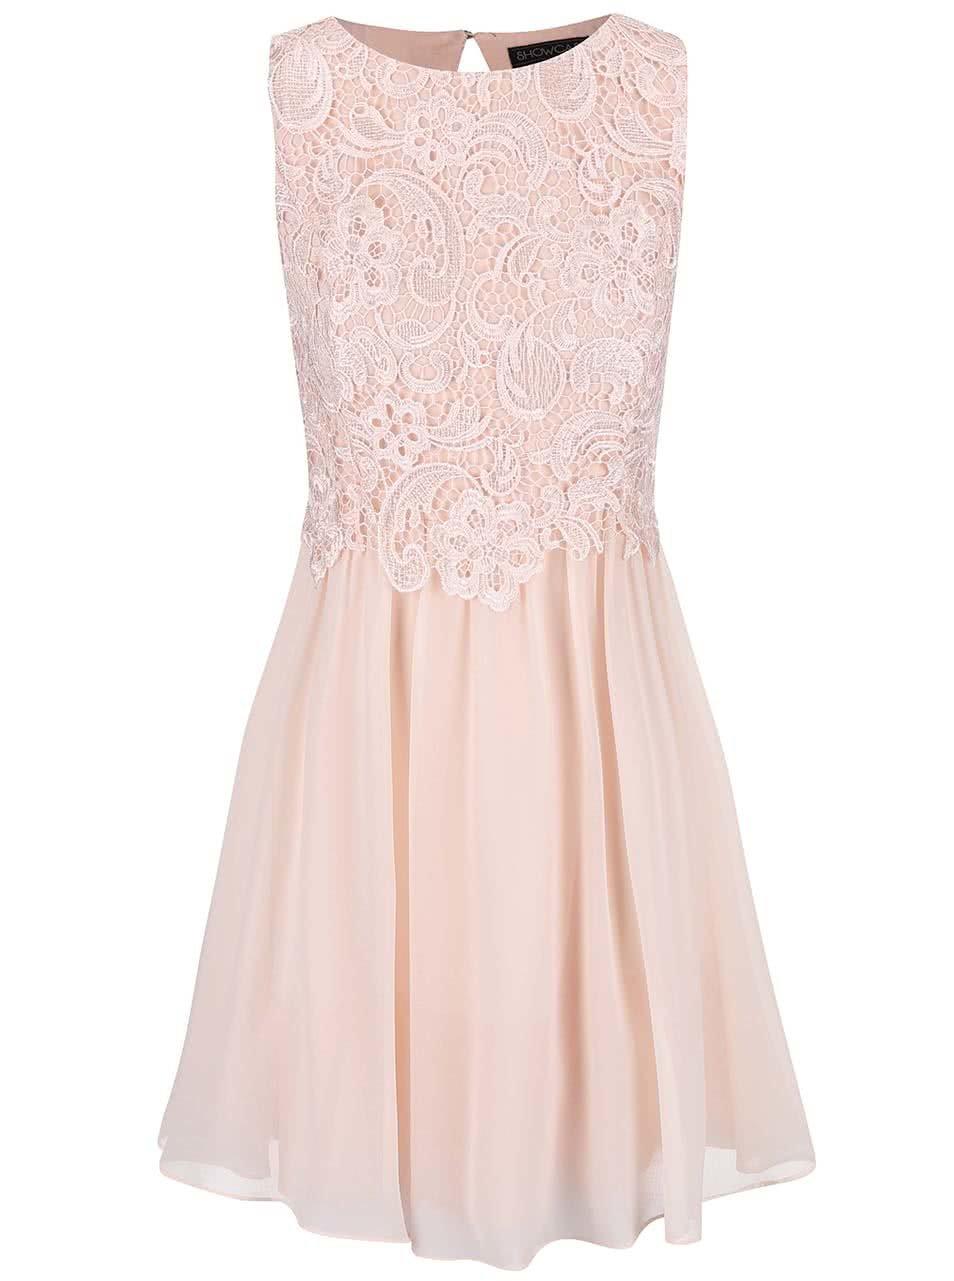 Světle růžové šaty s krajkovým topem Dorothy Perkins ... 3eddbcd2e2